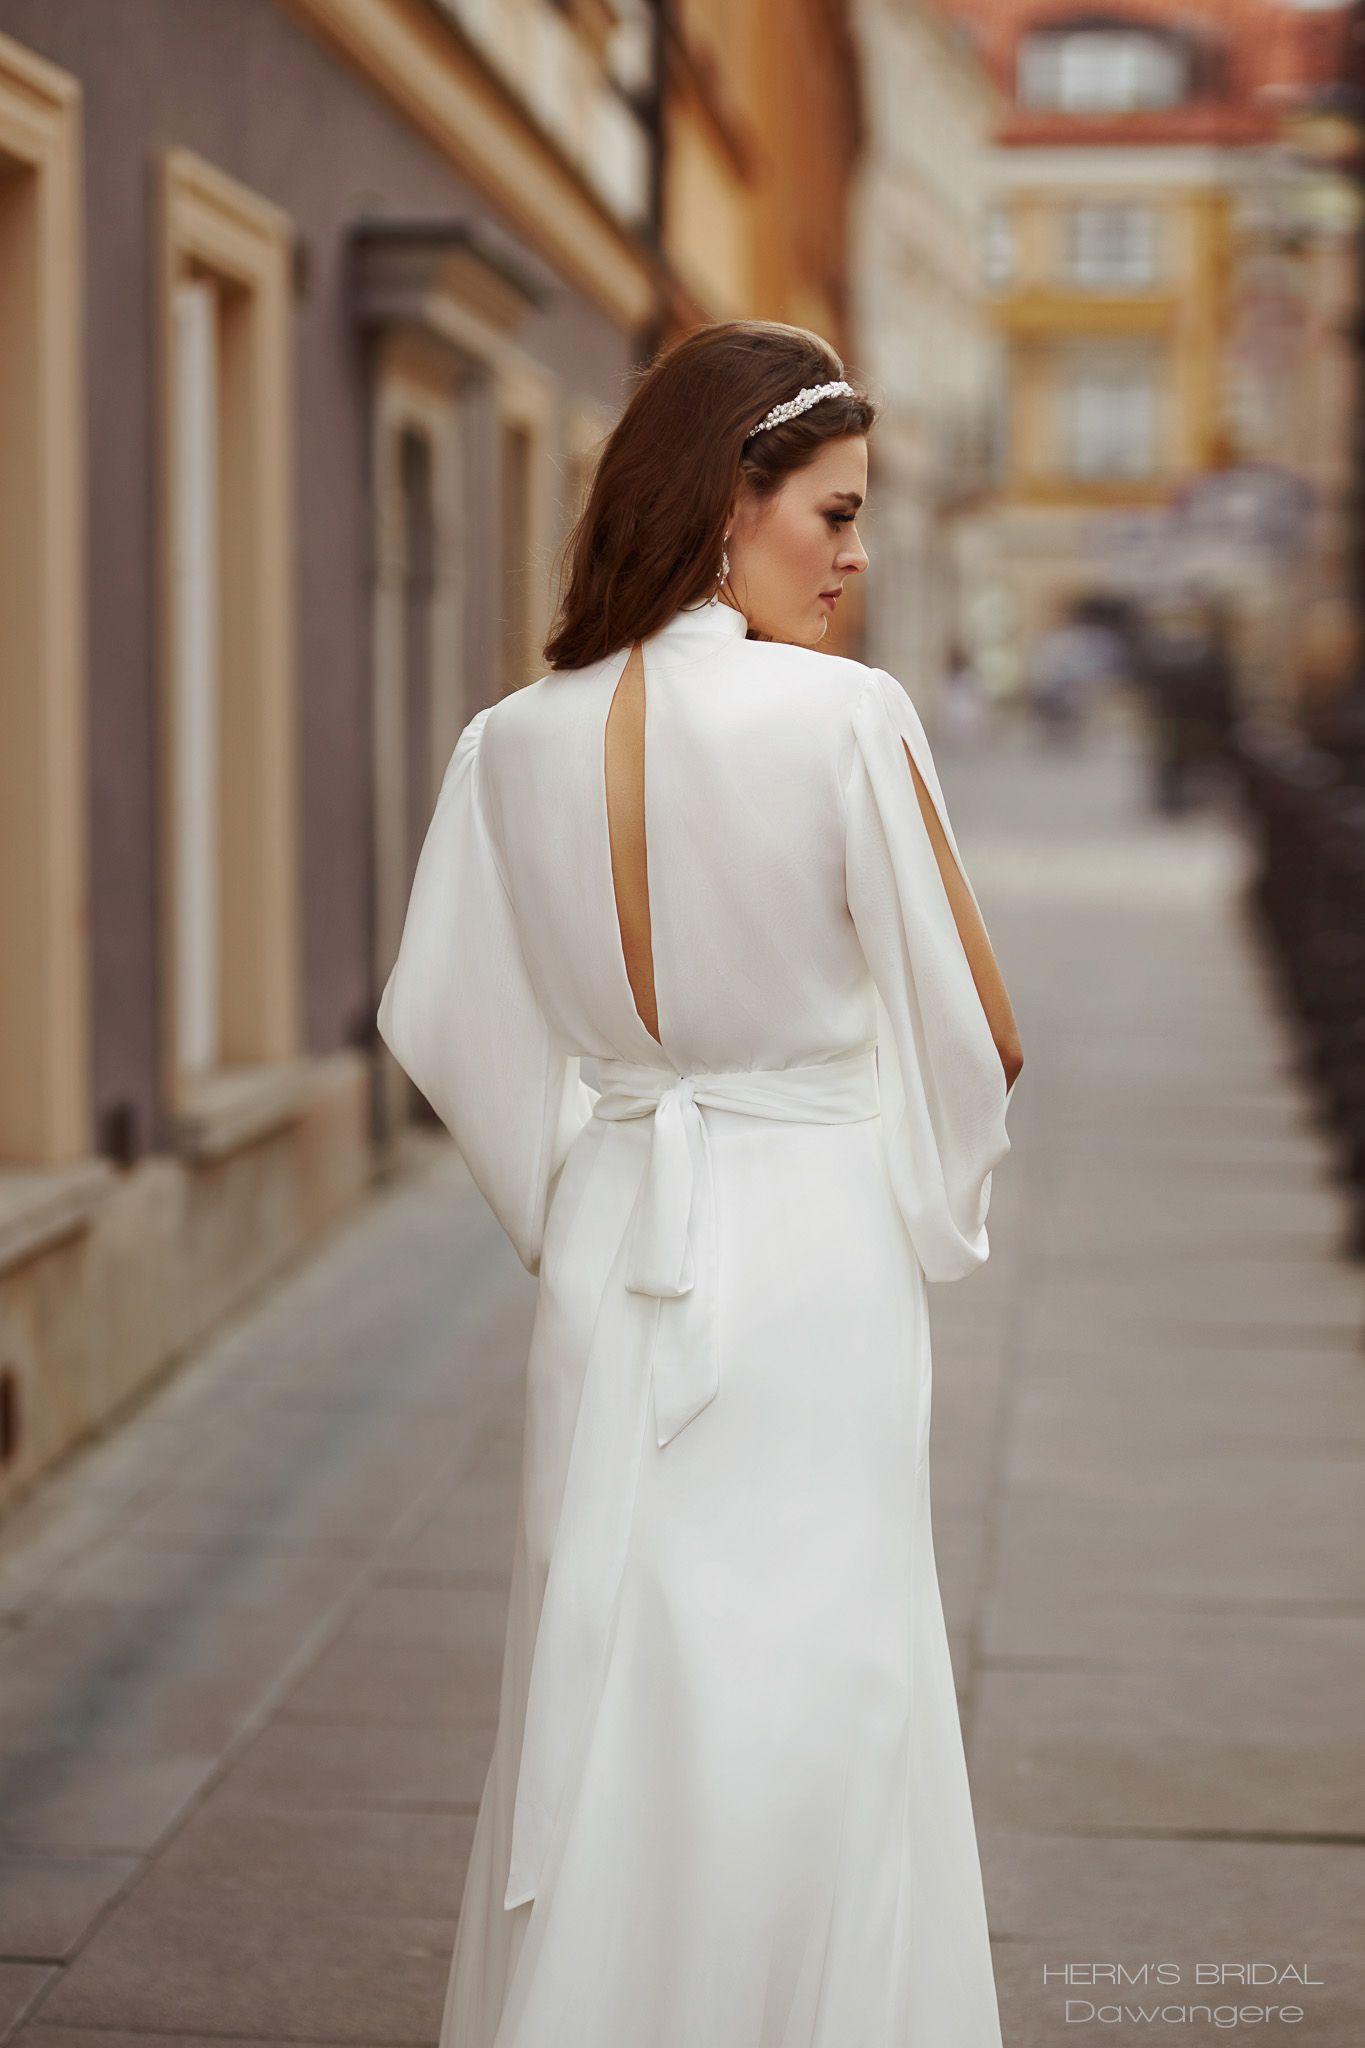 suknia slubna herms bridal Dawangere 4